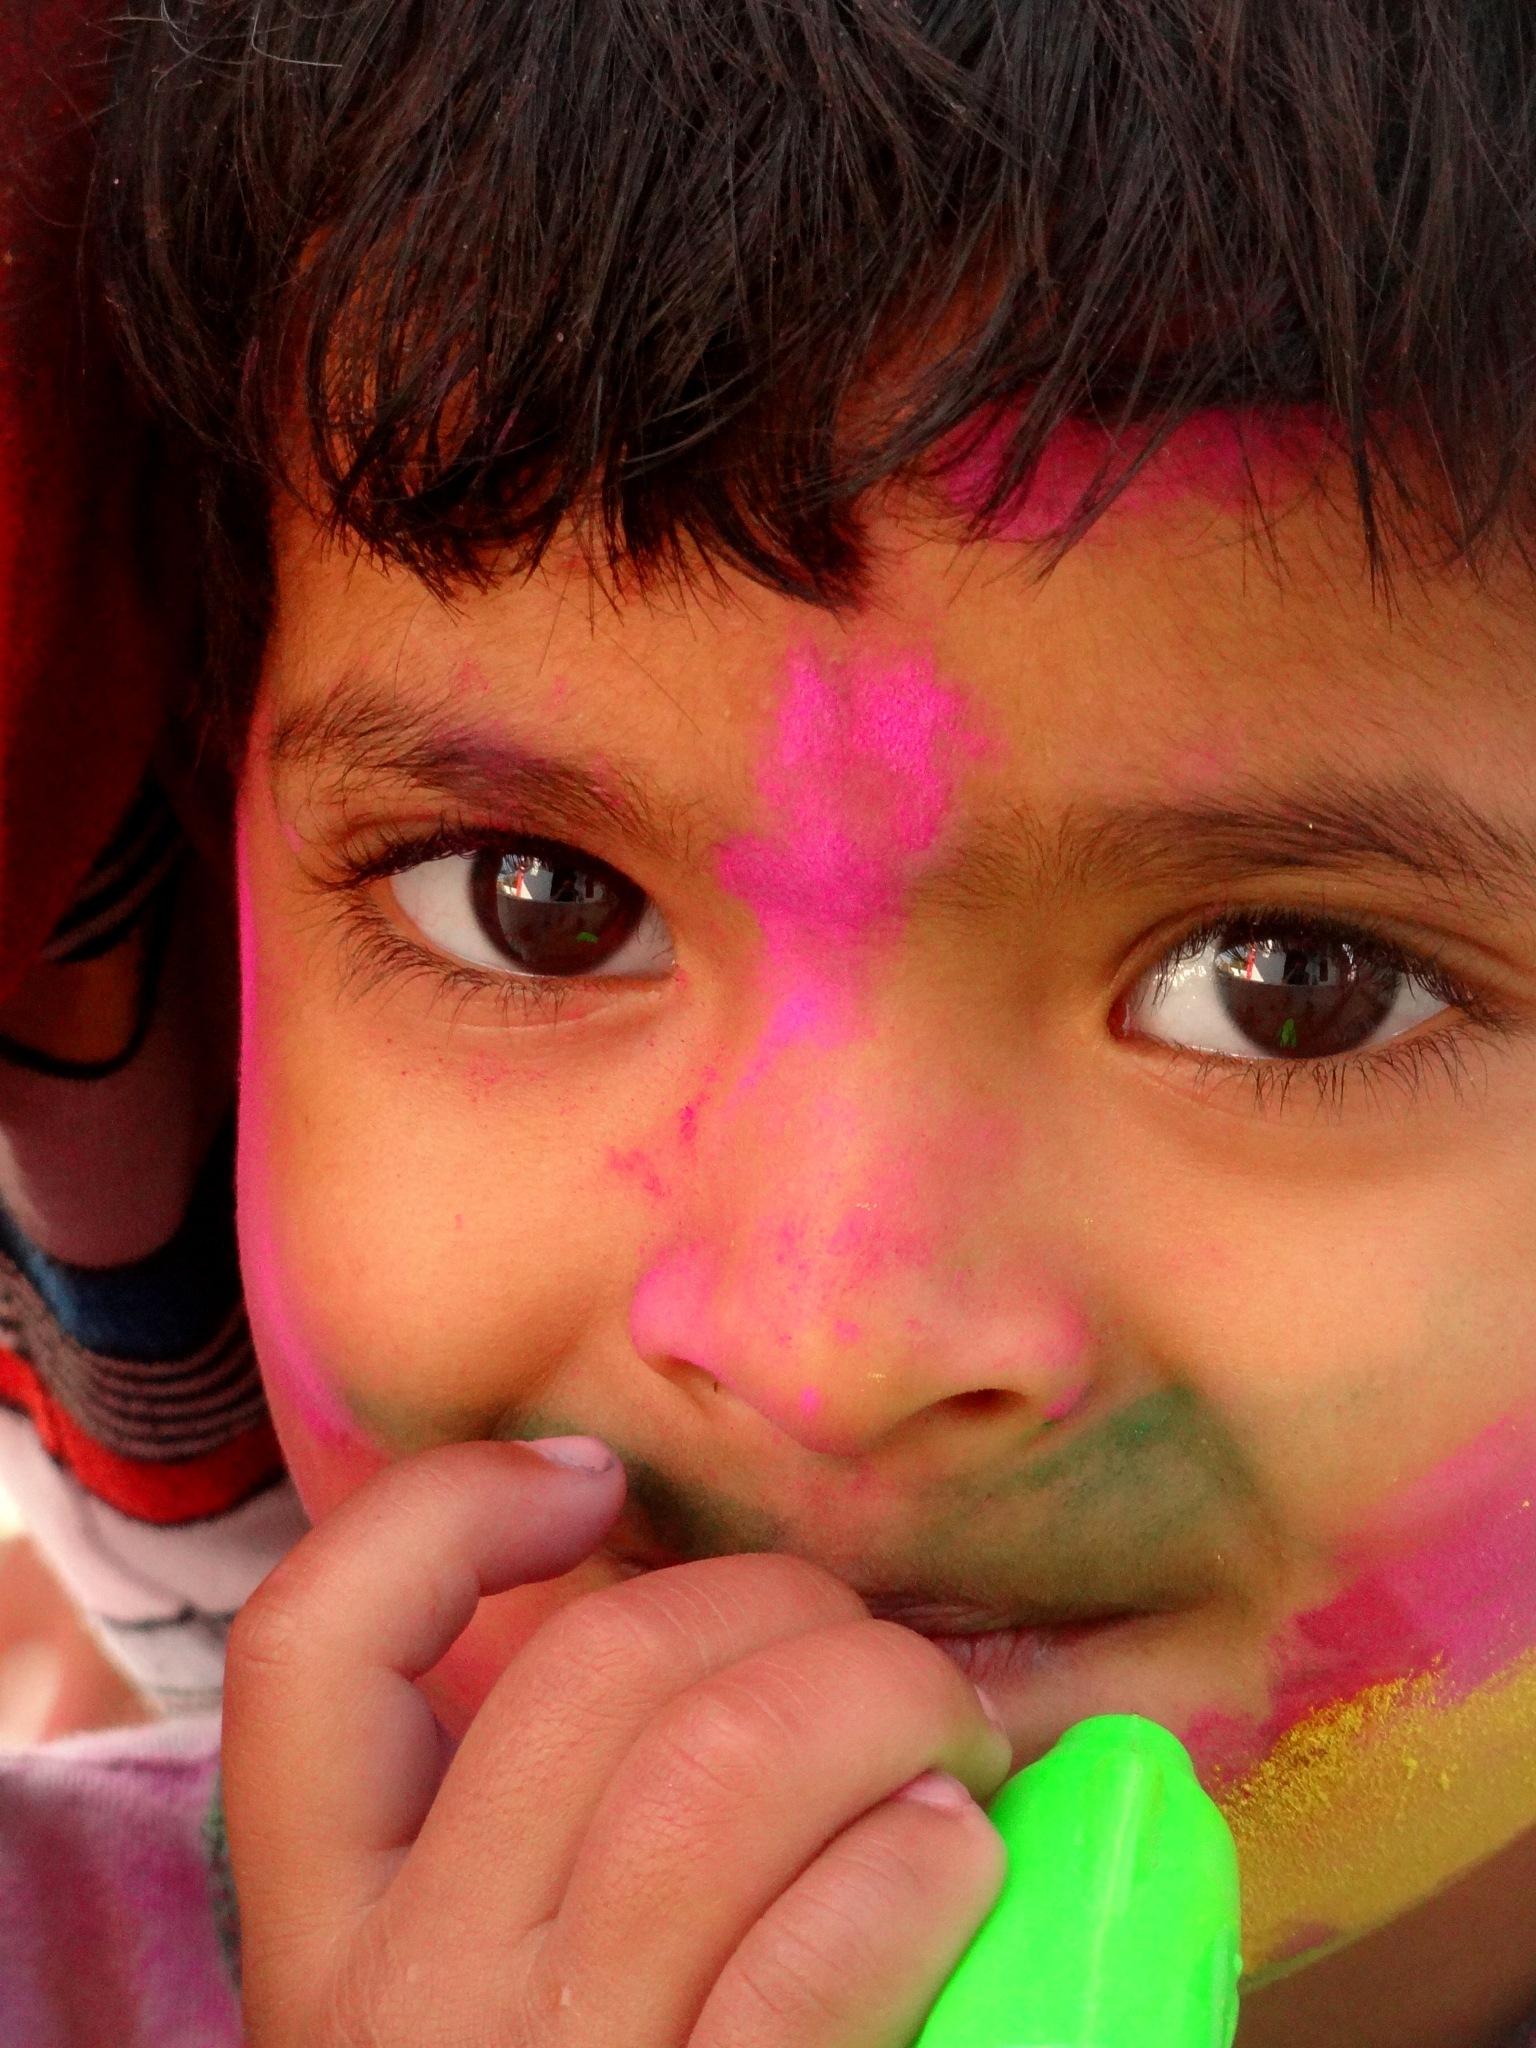 simplicity of childhood by akash dhanai 8888